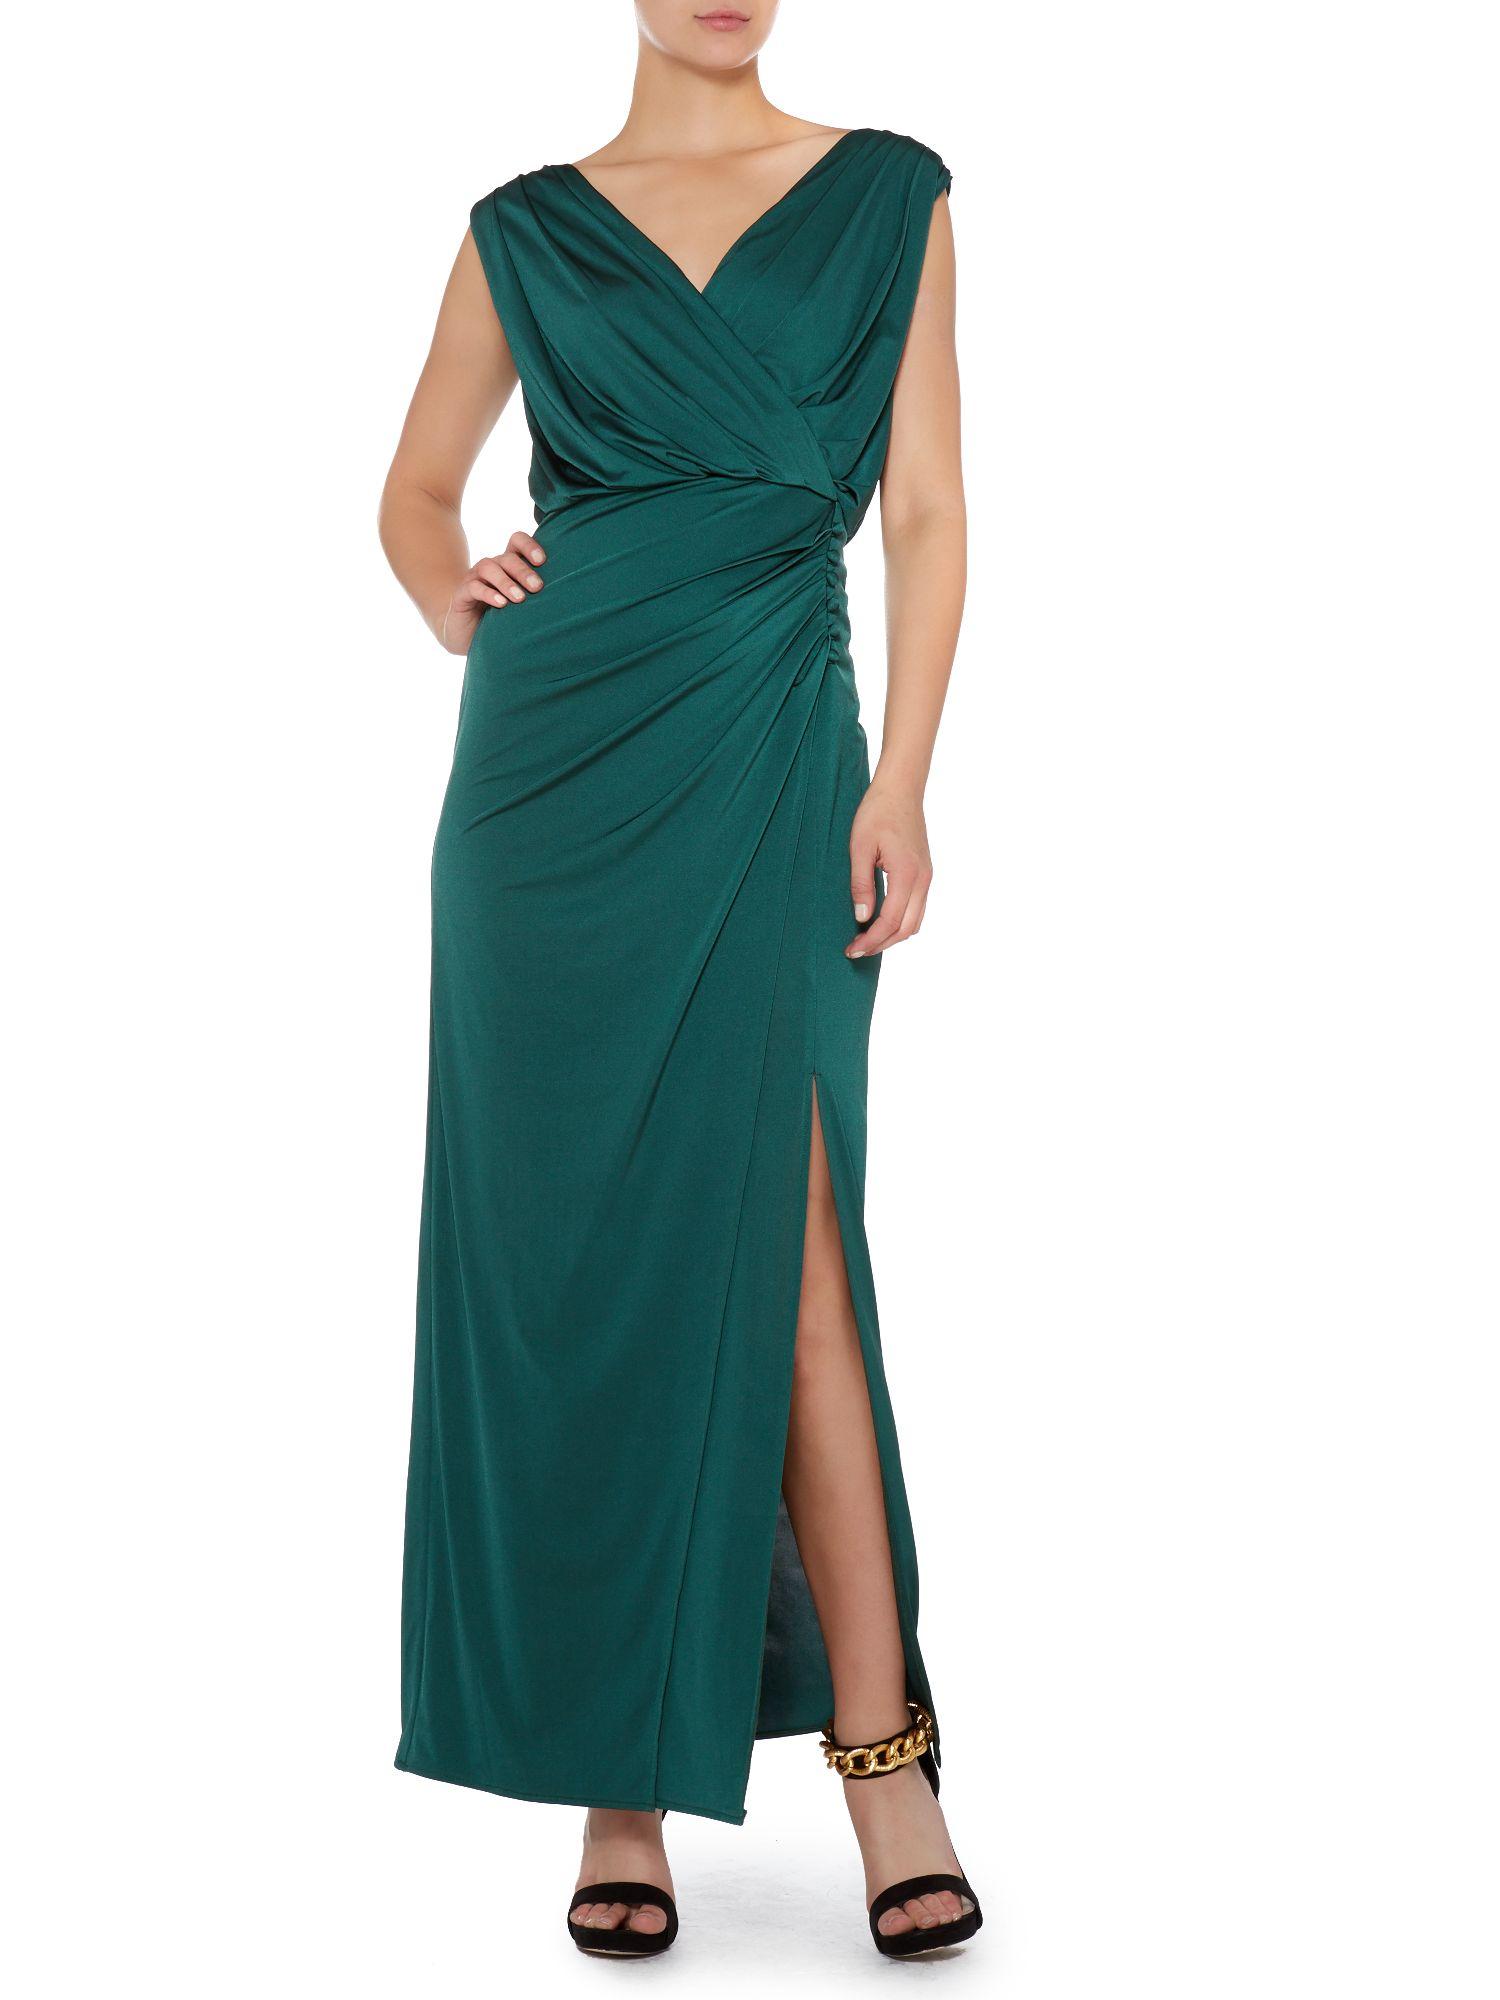 Biba Synthetic Wrap Over Maxi Dress In Bottle Green Green